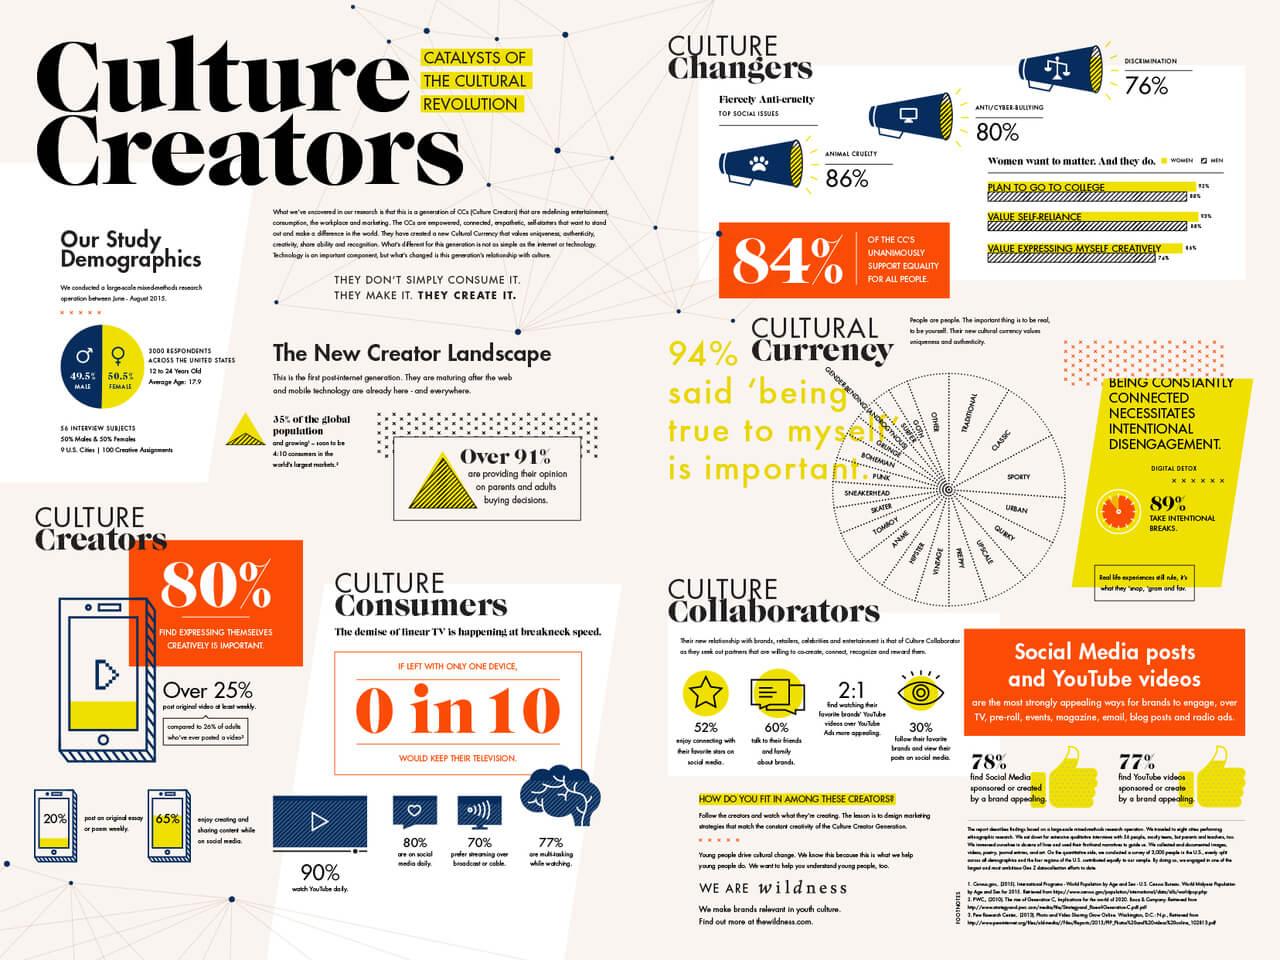 Best Infographics: Culture Creators: Catalysts Of The Creative Revolution